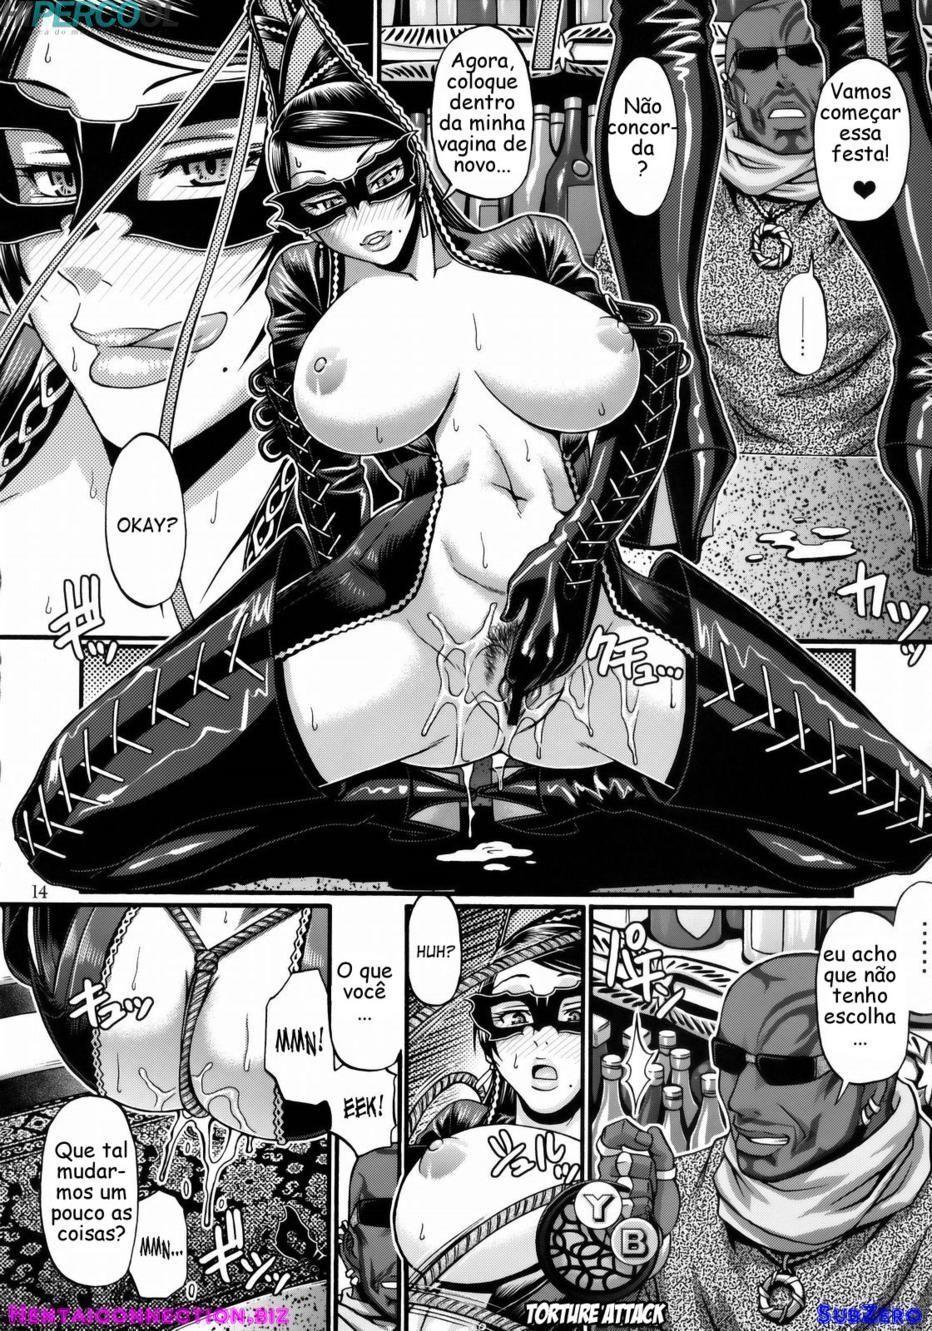 Bayonetta-hentai-Home-13